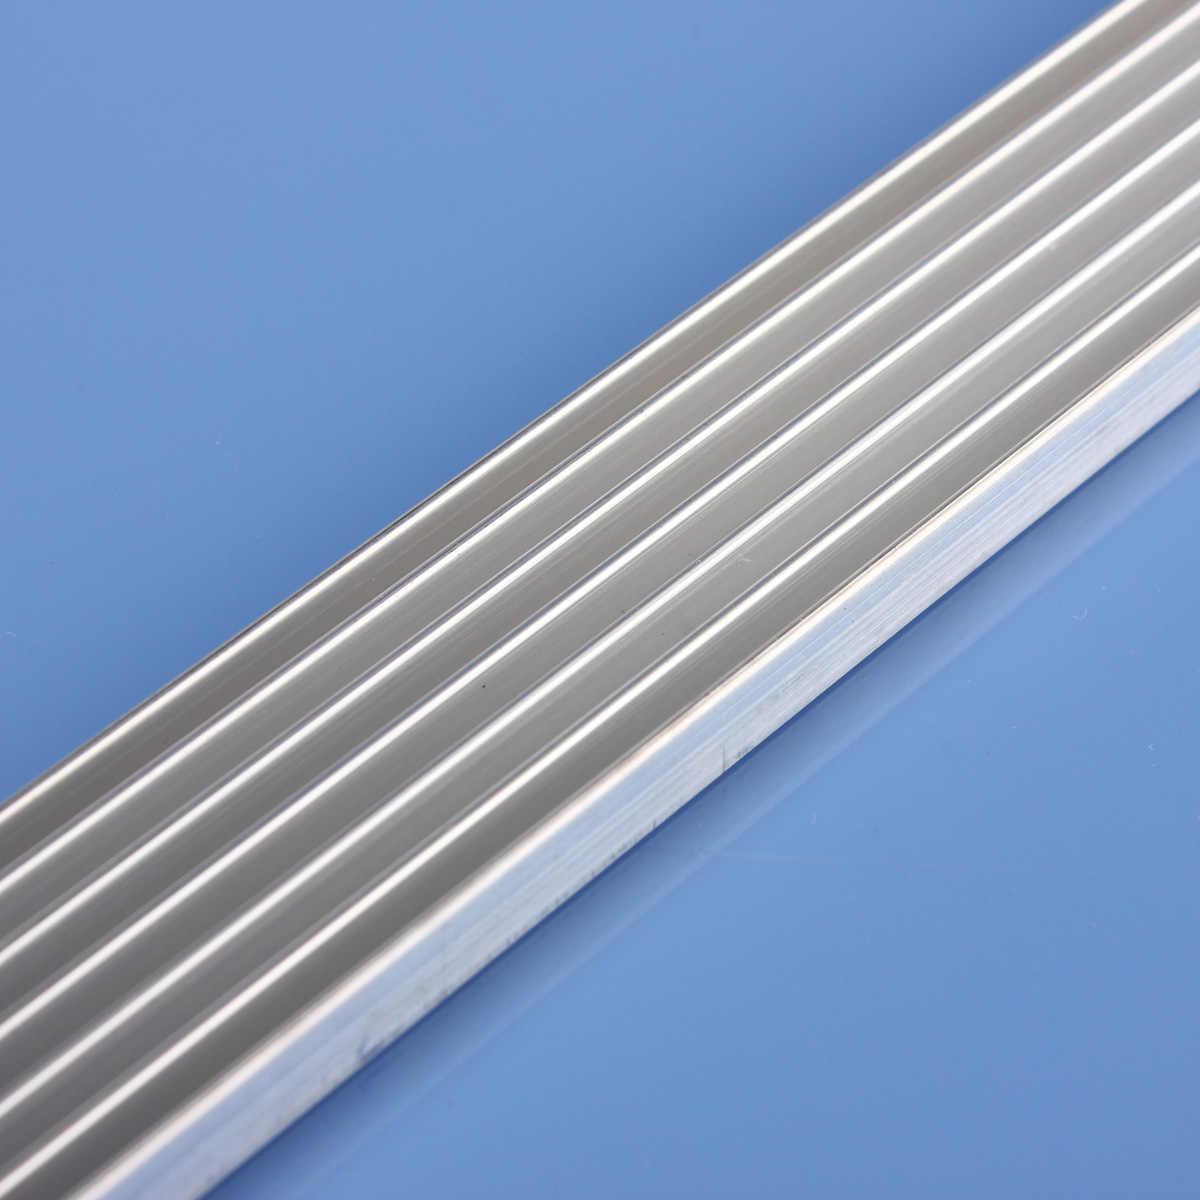 Hohe Qualität 150mm * 20mm * 6mm High Power LED Aluminium Kühlkörper für 1 W 3 W 5 W LED Emitter Dioden Kühlung Kühler